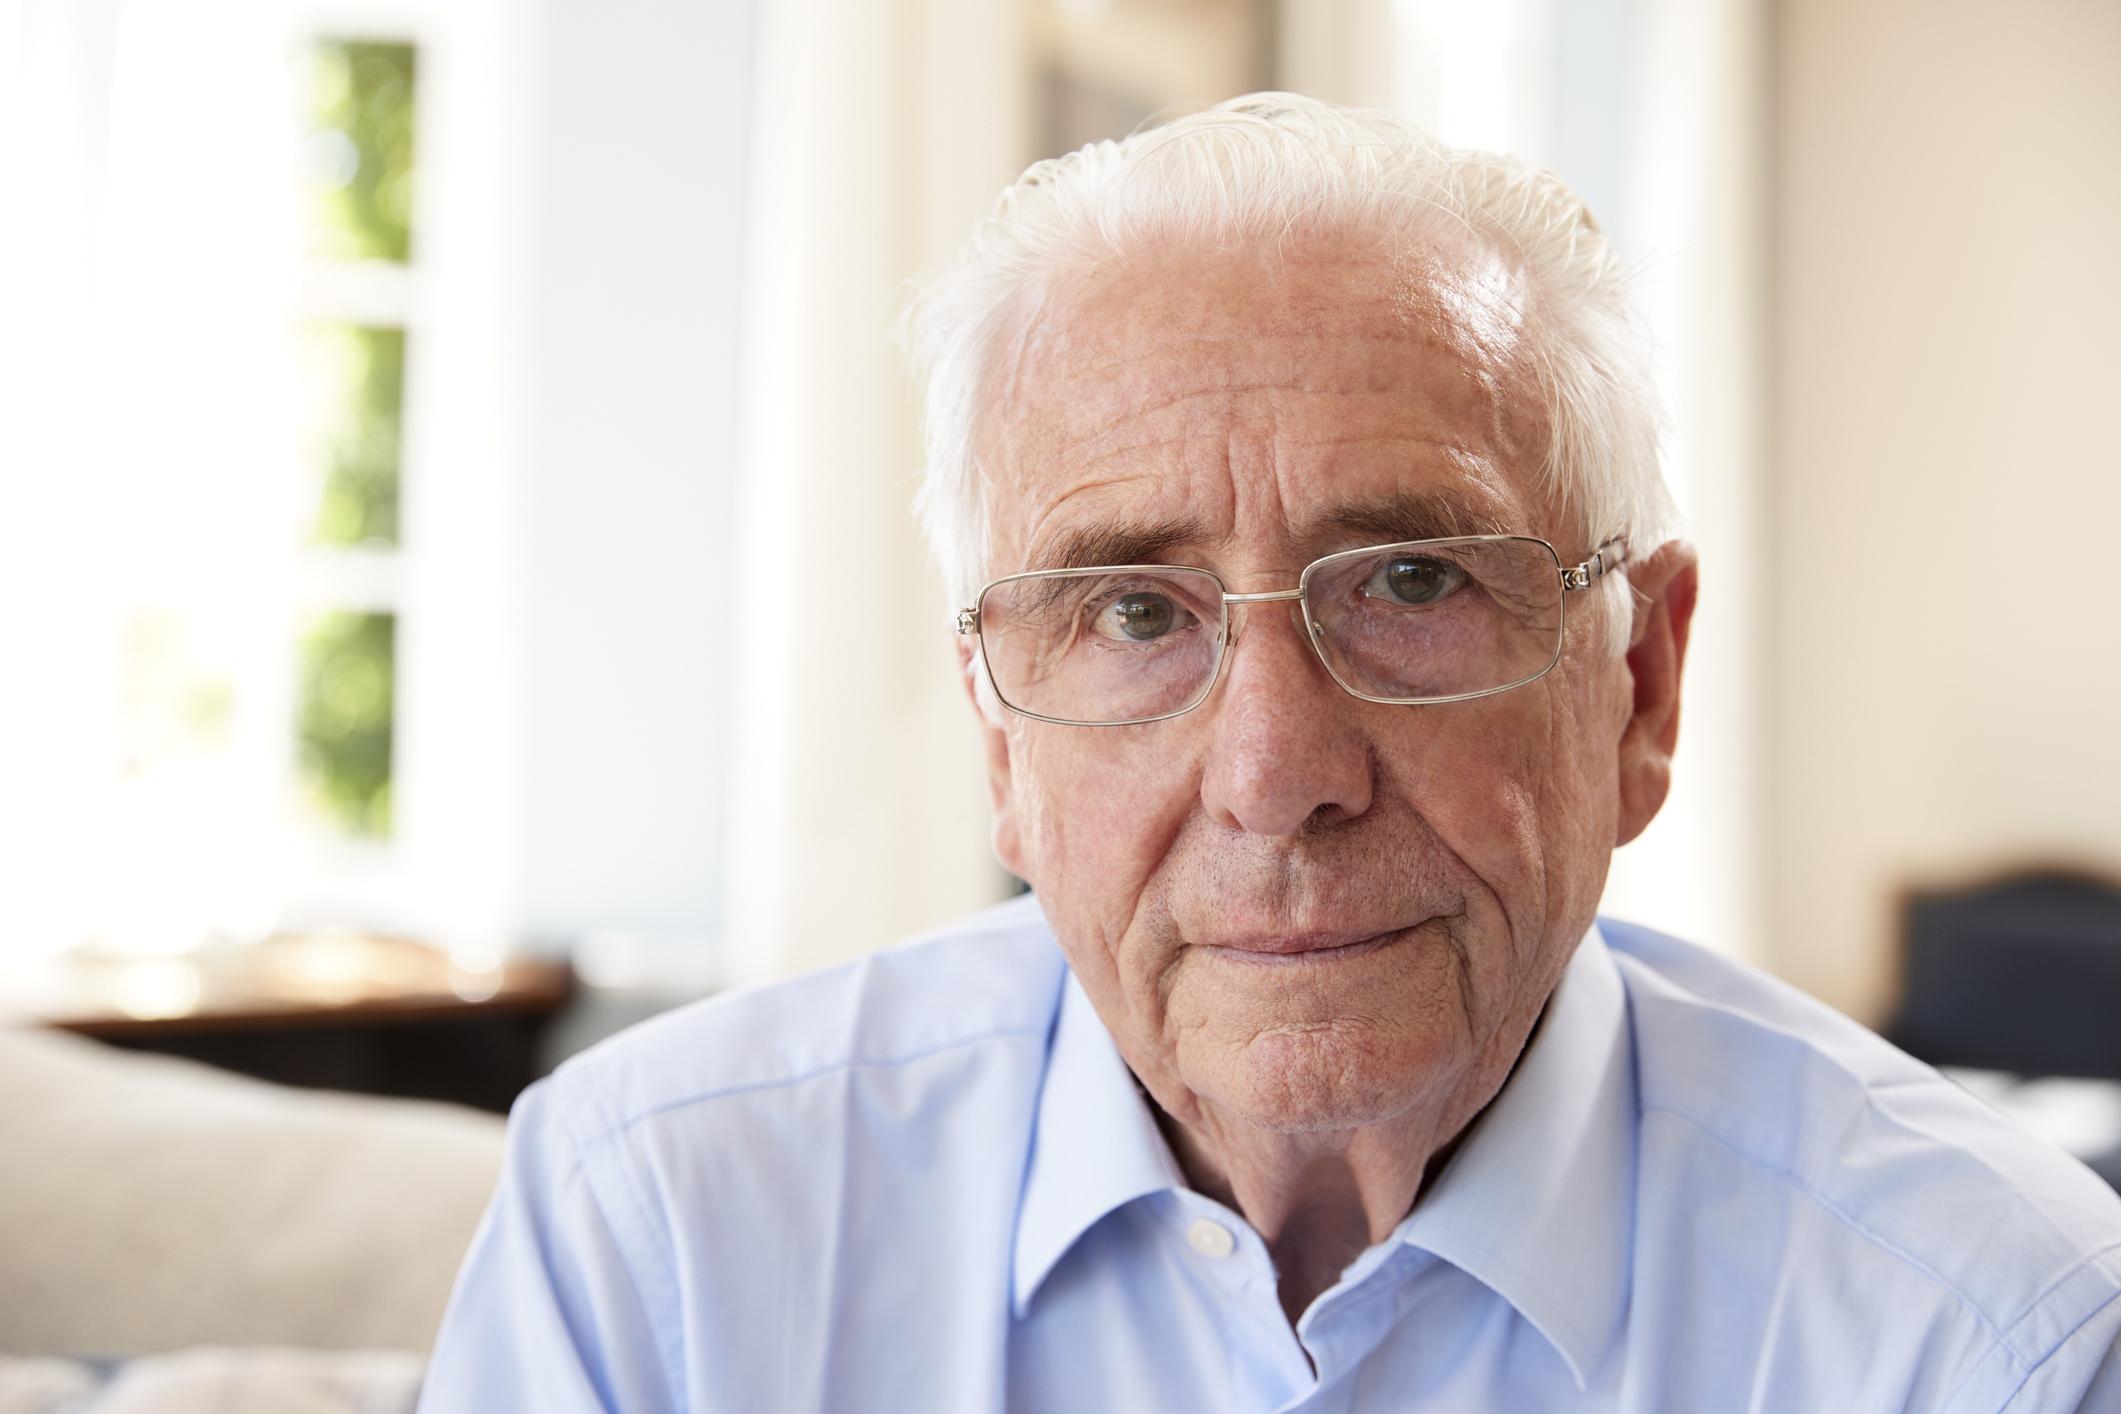 Older man with sad expression